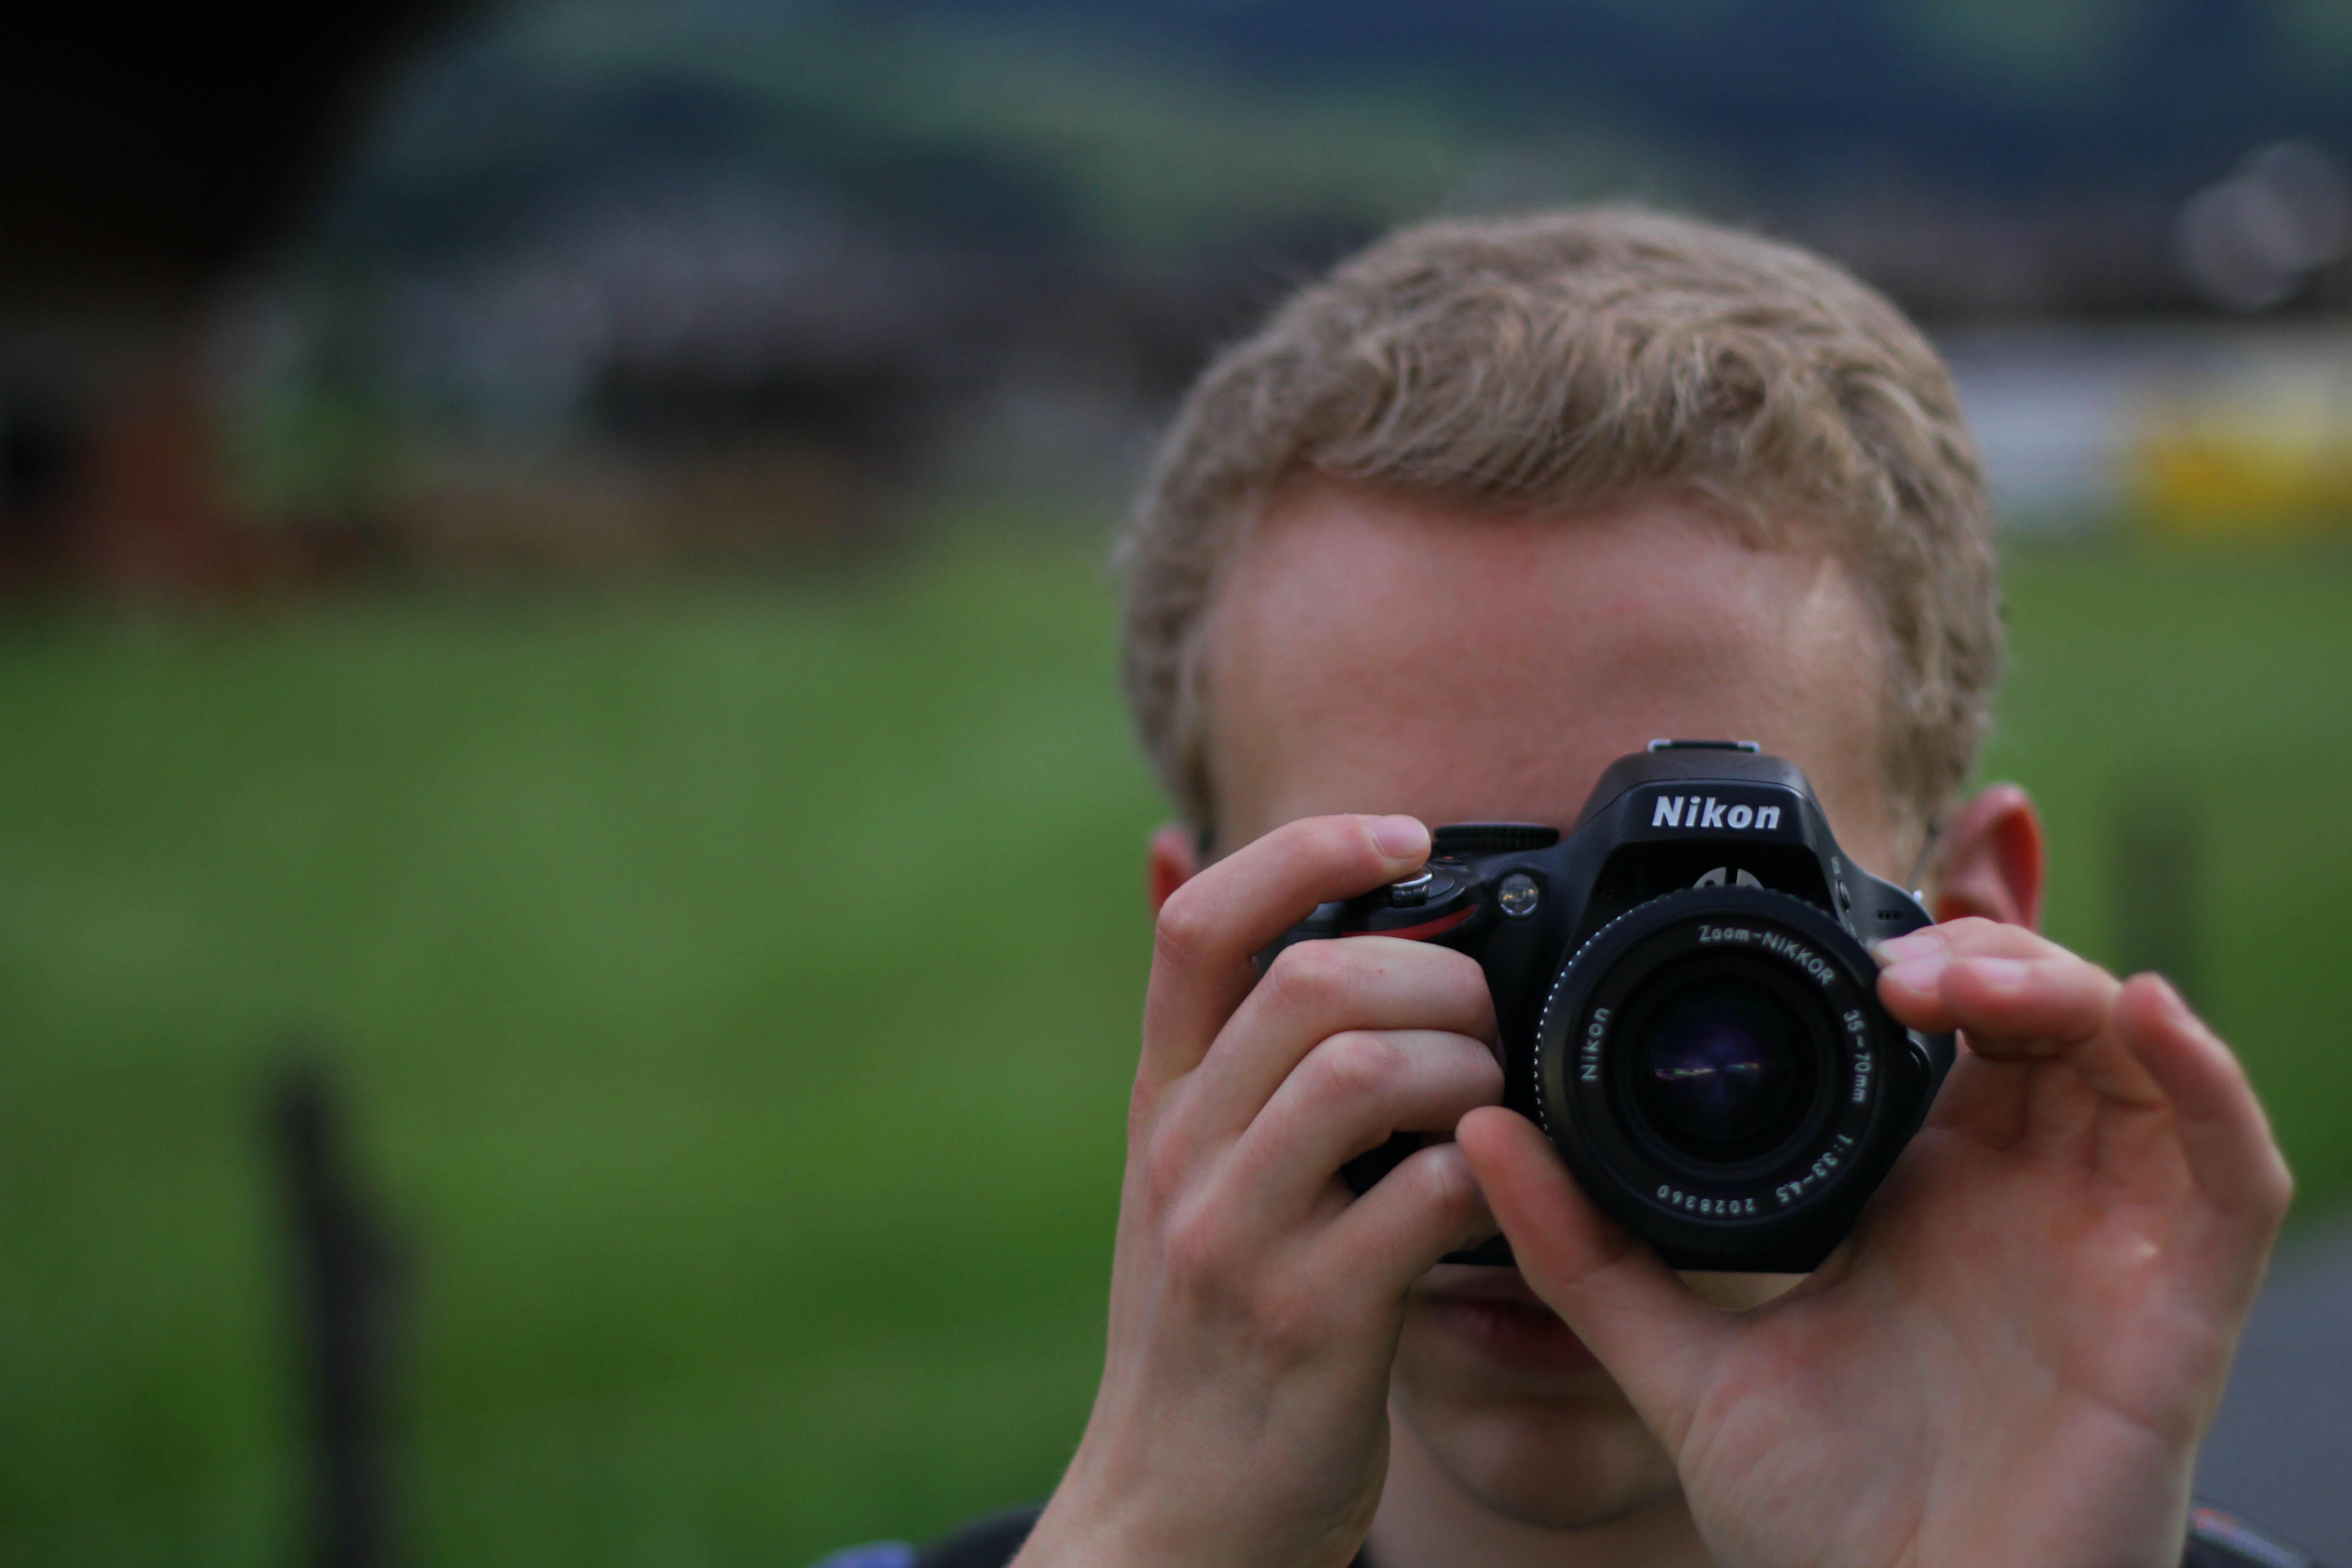 Go to Daniel von Aarburg's profile